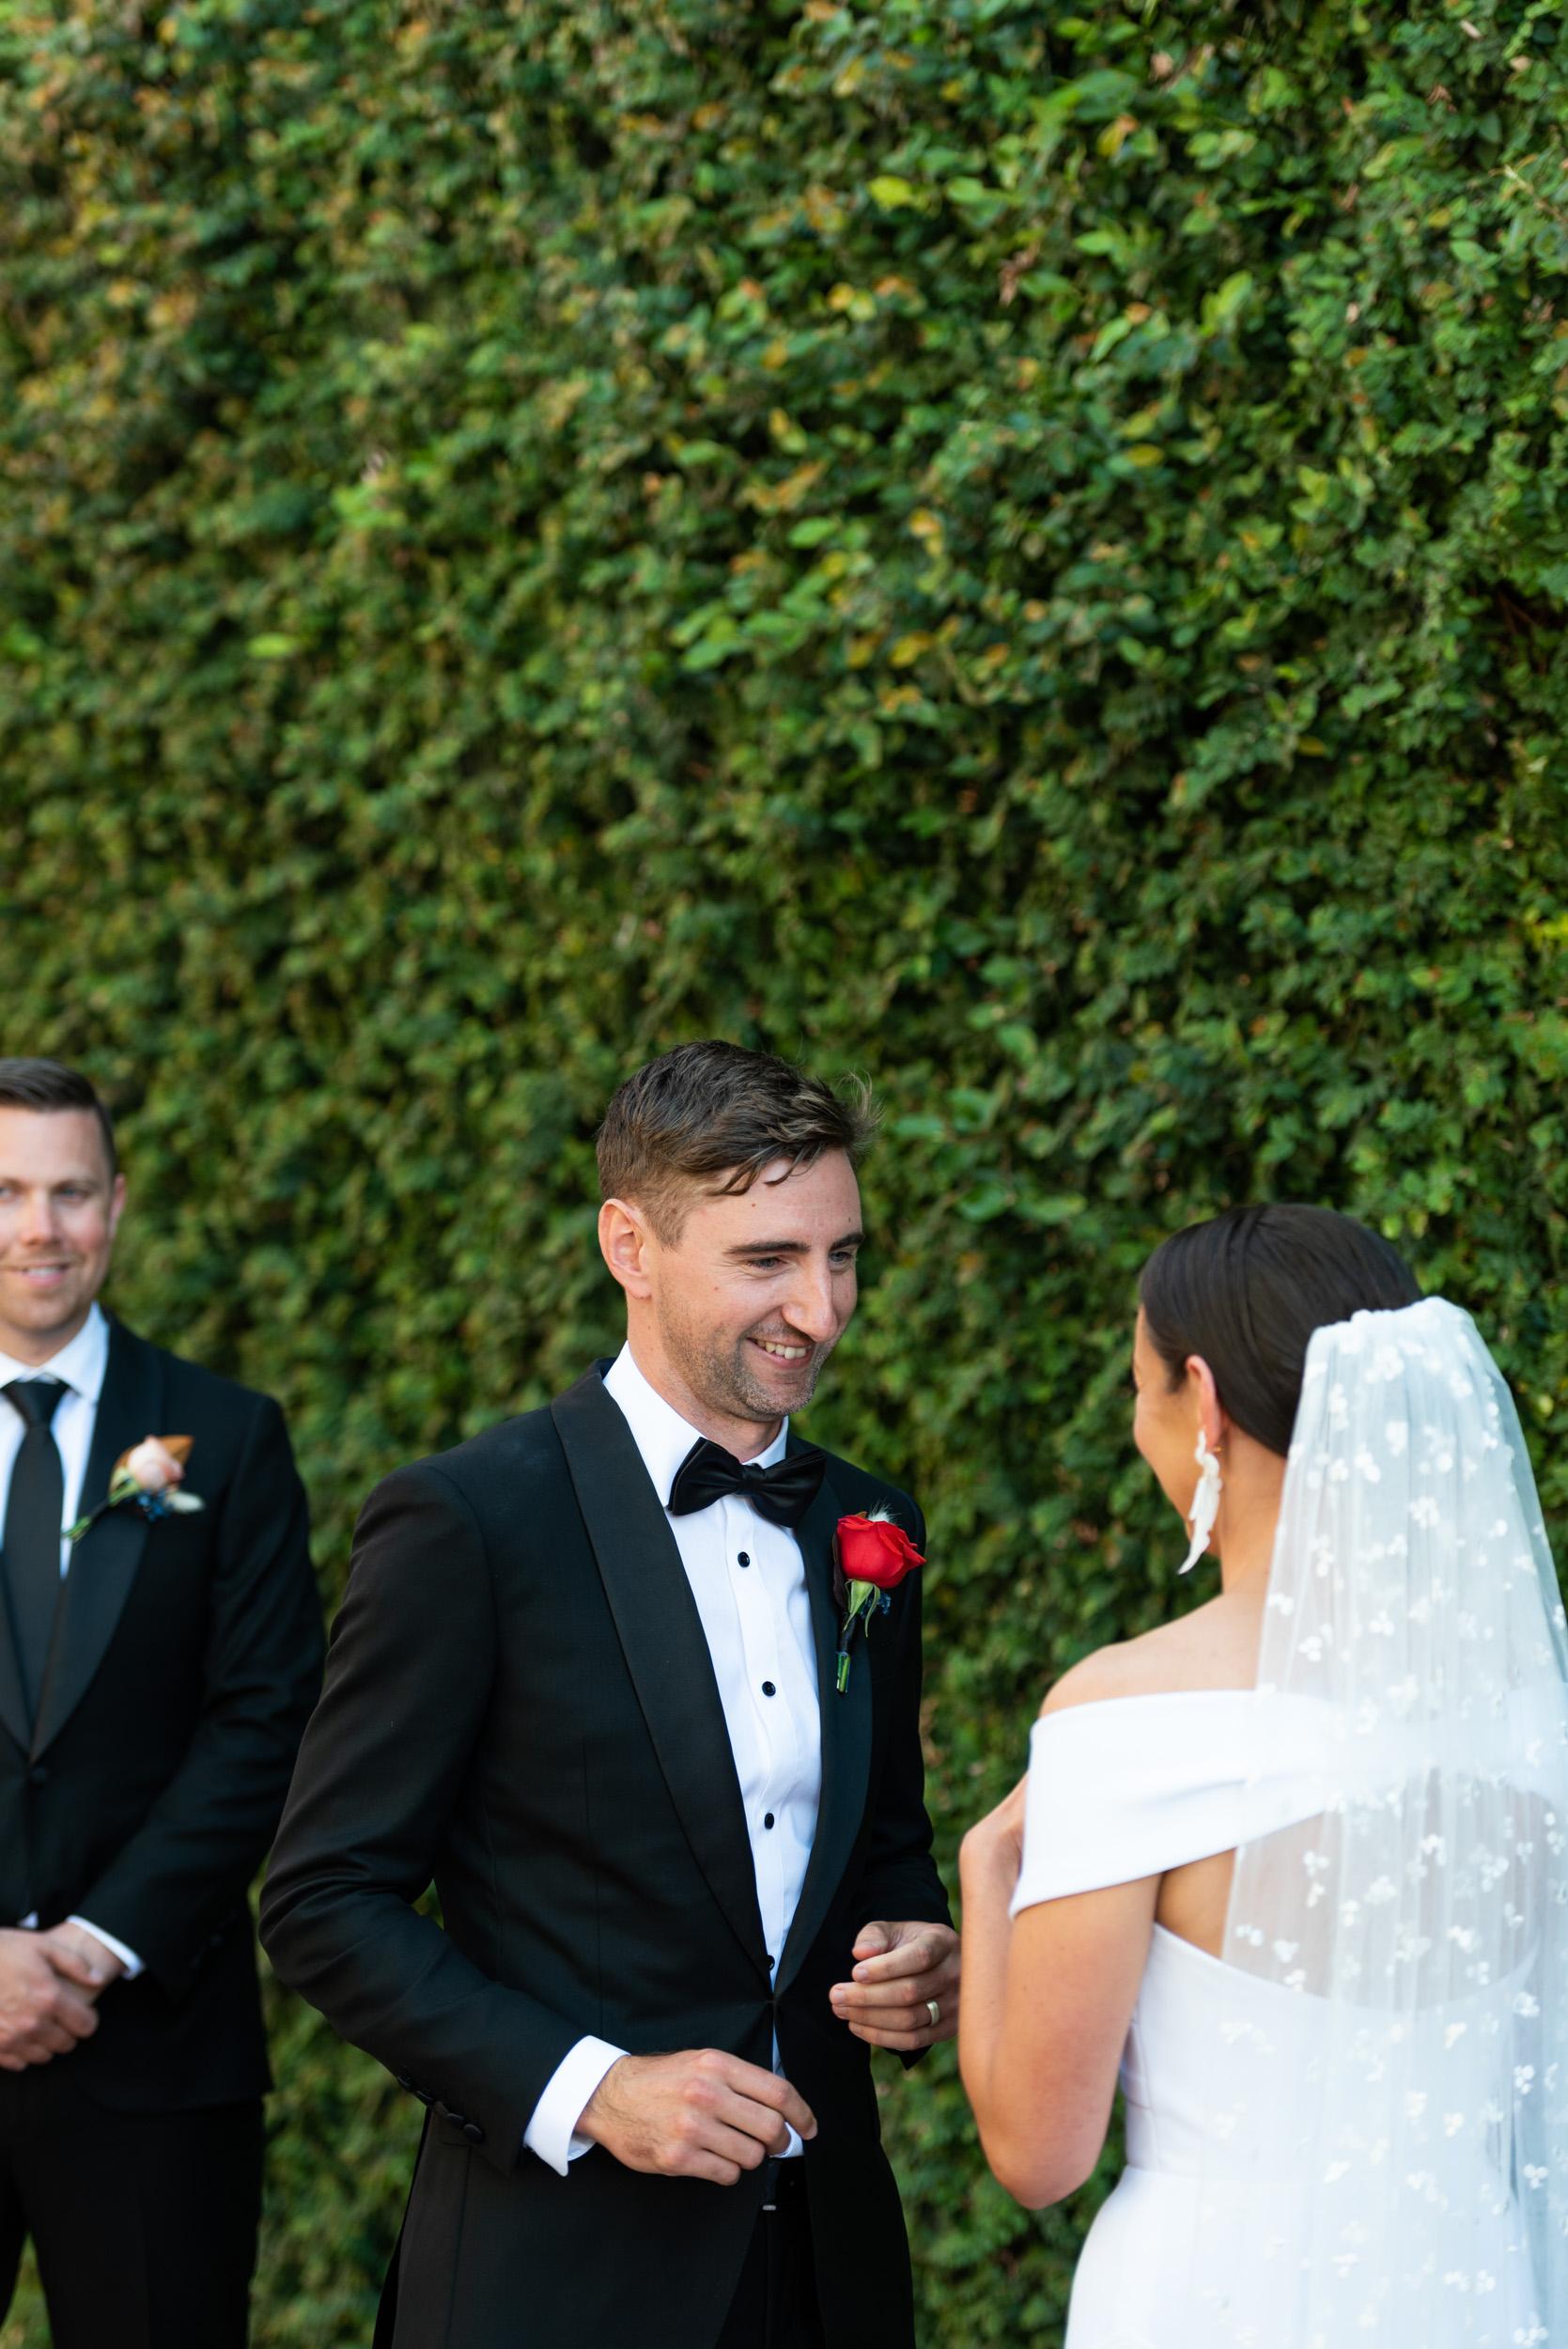 Wedding, Wedding Day, Groom, Happy, Wedding Ceremony